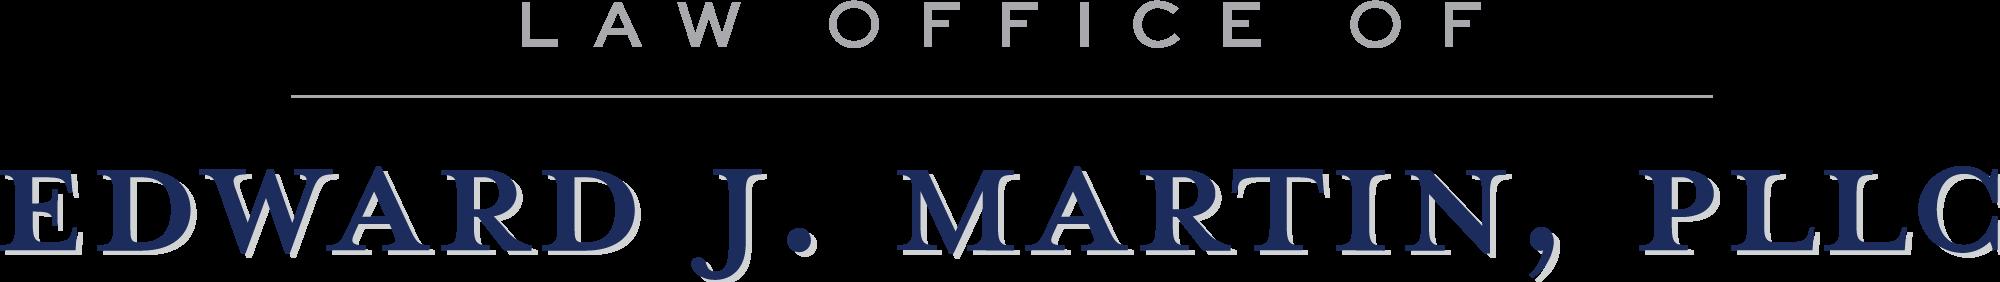 Law Office of Edward J. Martin, PLLC